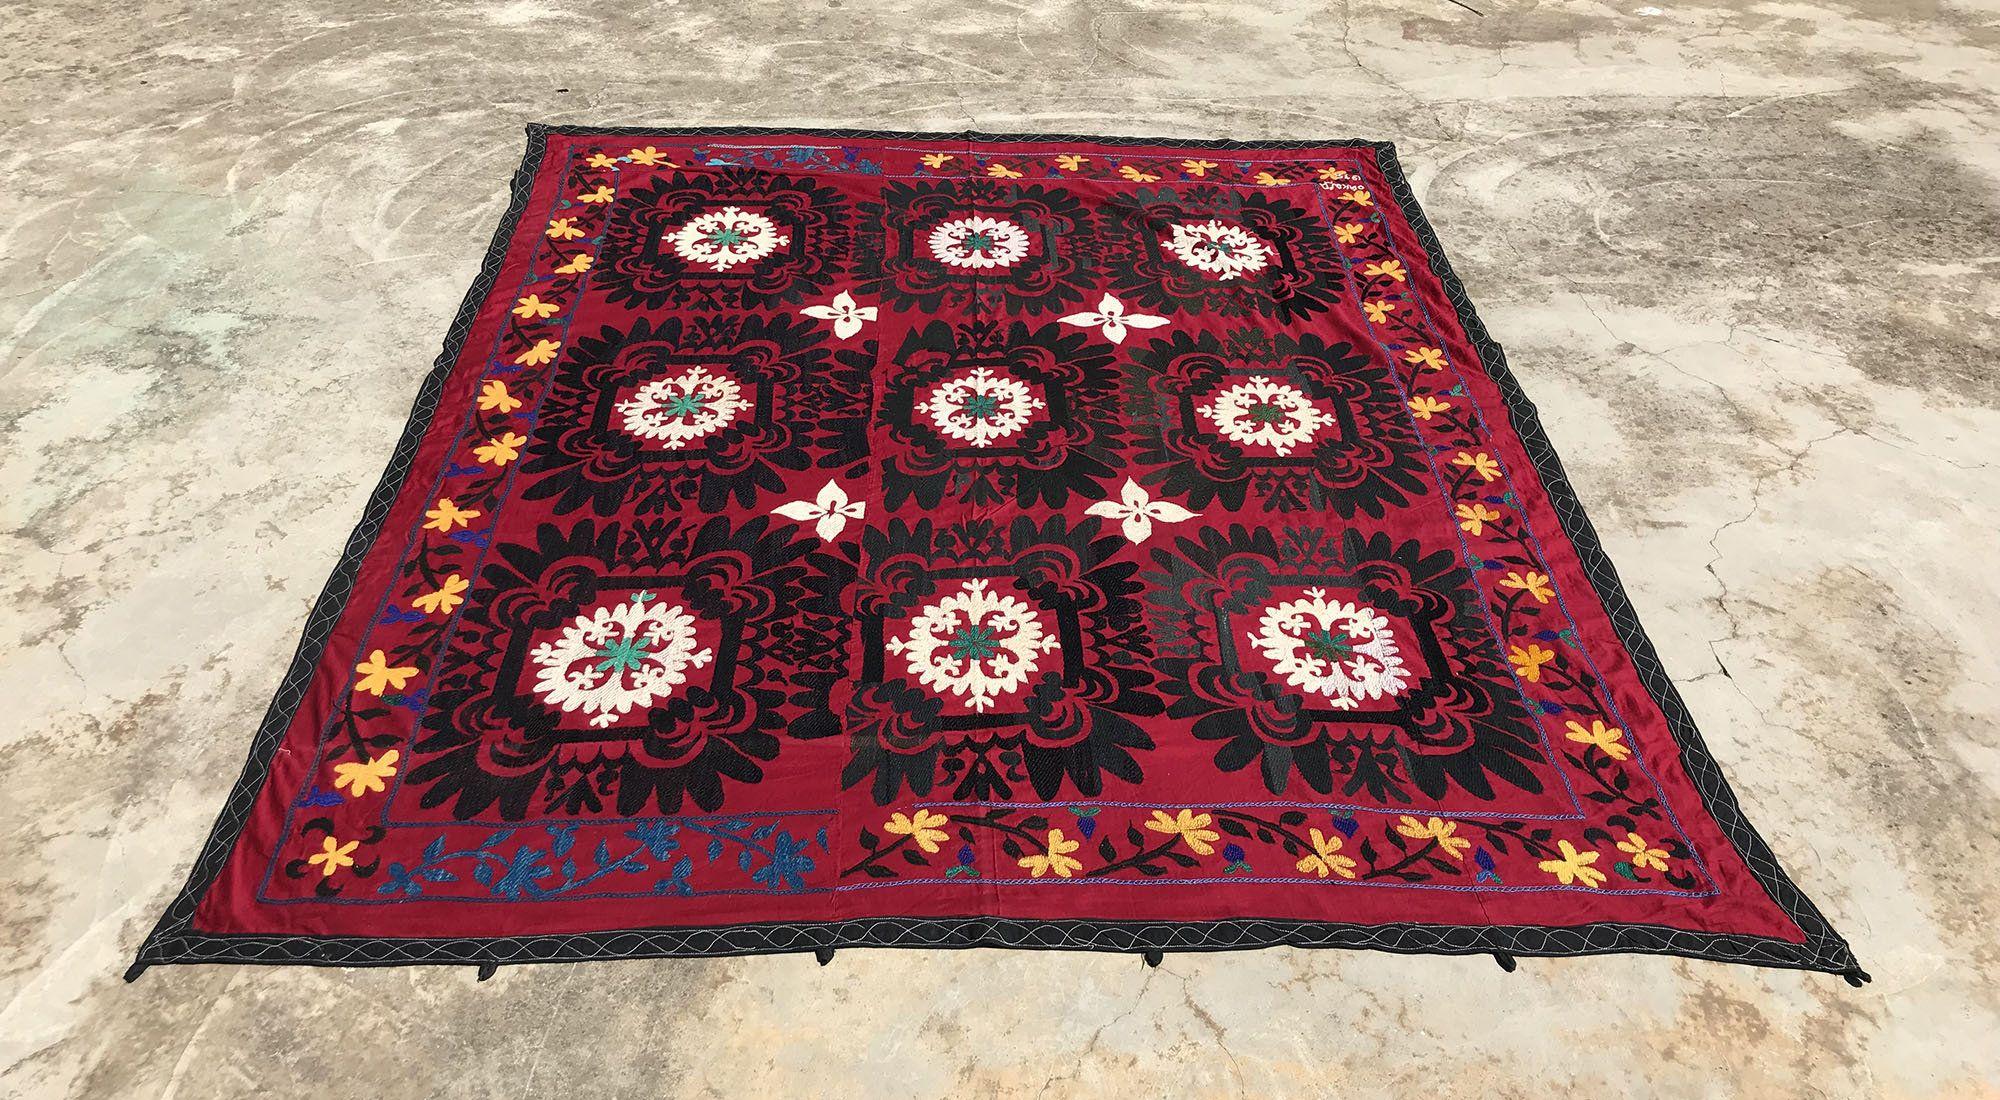 7 2x6 8 Vintage Wall Hanging Suzani Blanket Suzani Etsy Suzani Fabric Suzani Traditional Bed